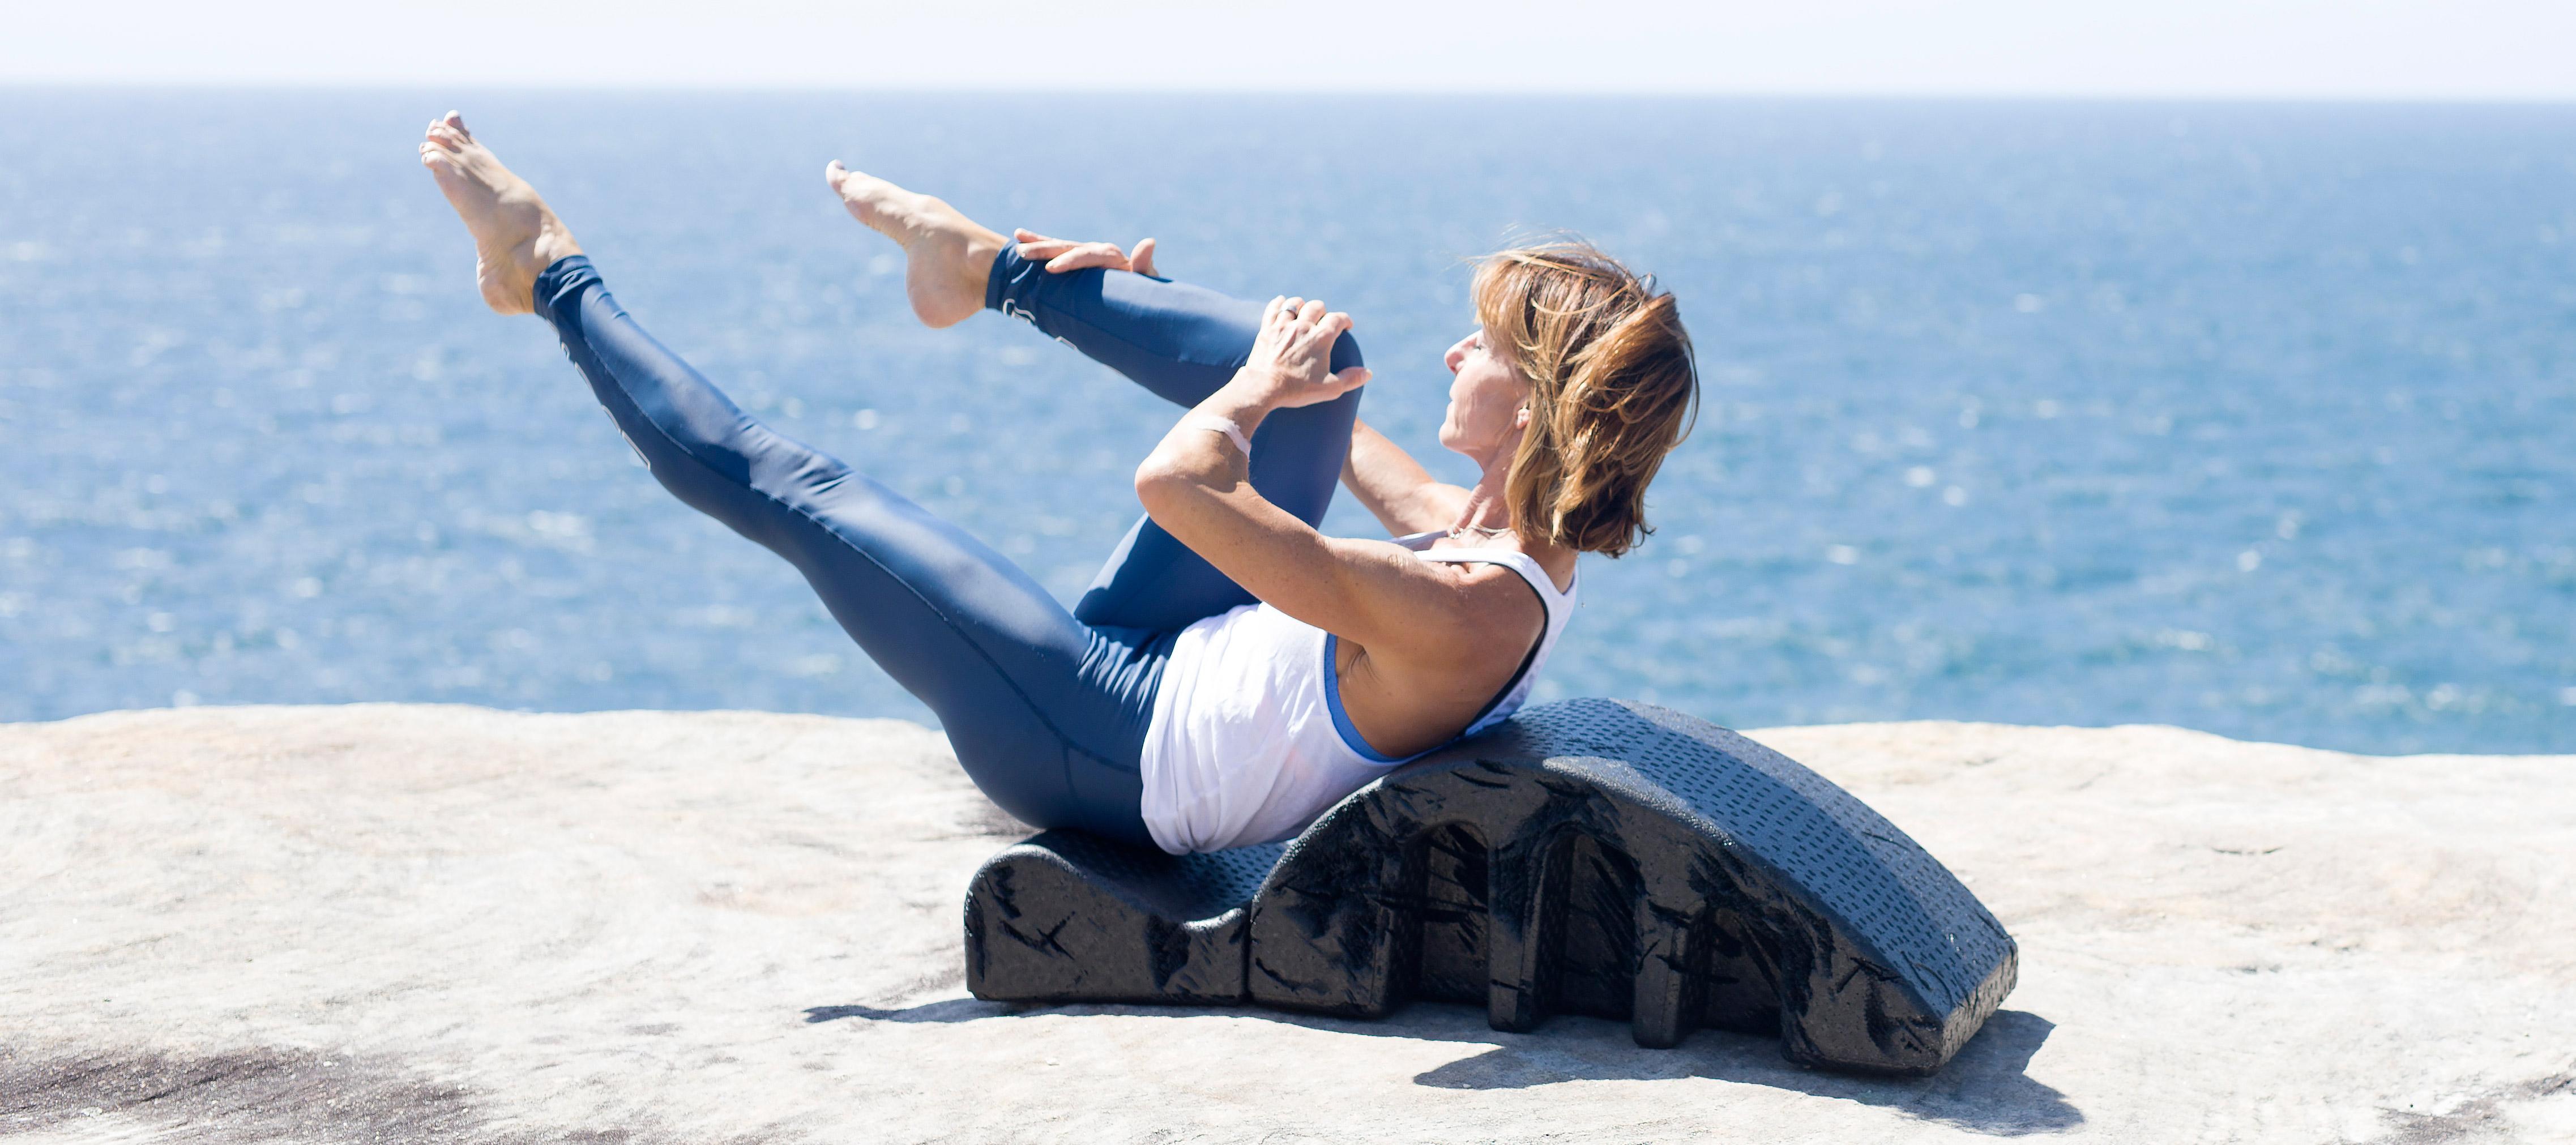 mpower-pilates-cycle-studio-birmingham-alabama-7